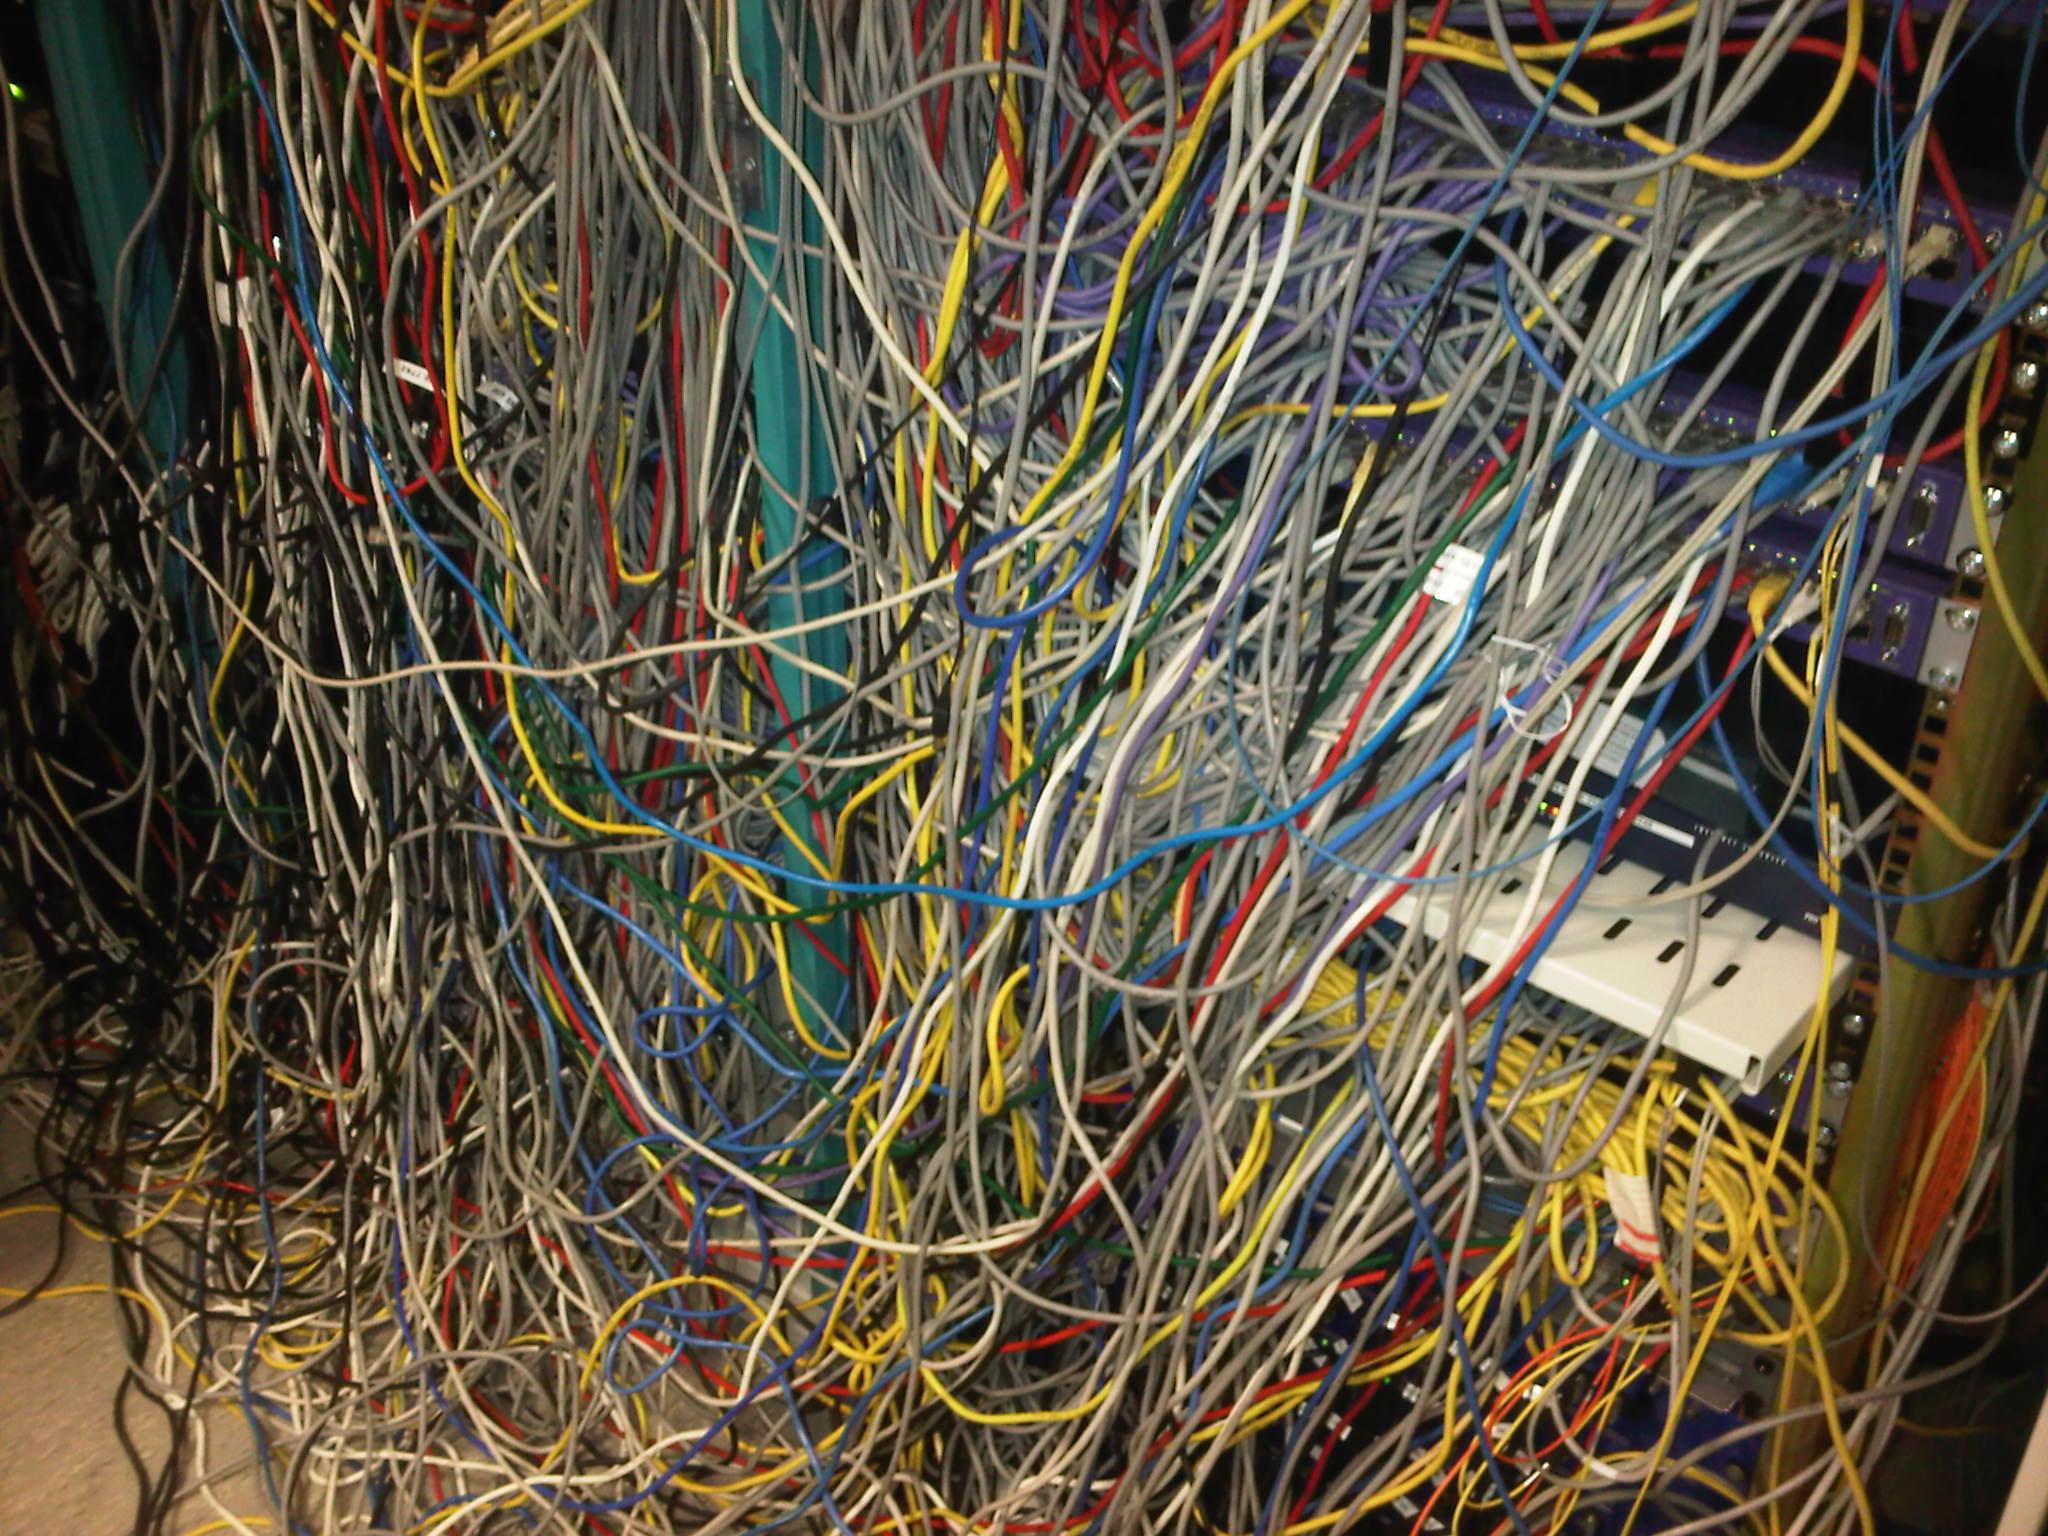 Network Cables Wallpaper Wallpaper Wide Hd